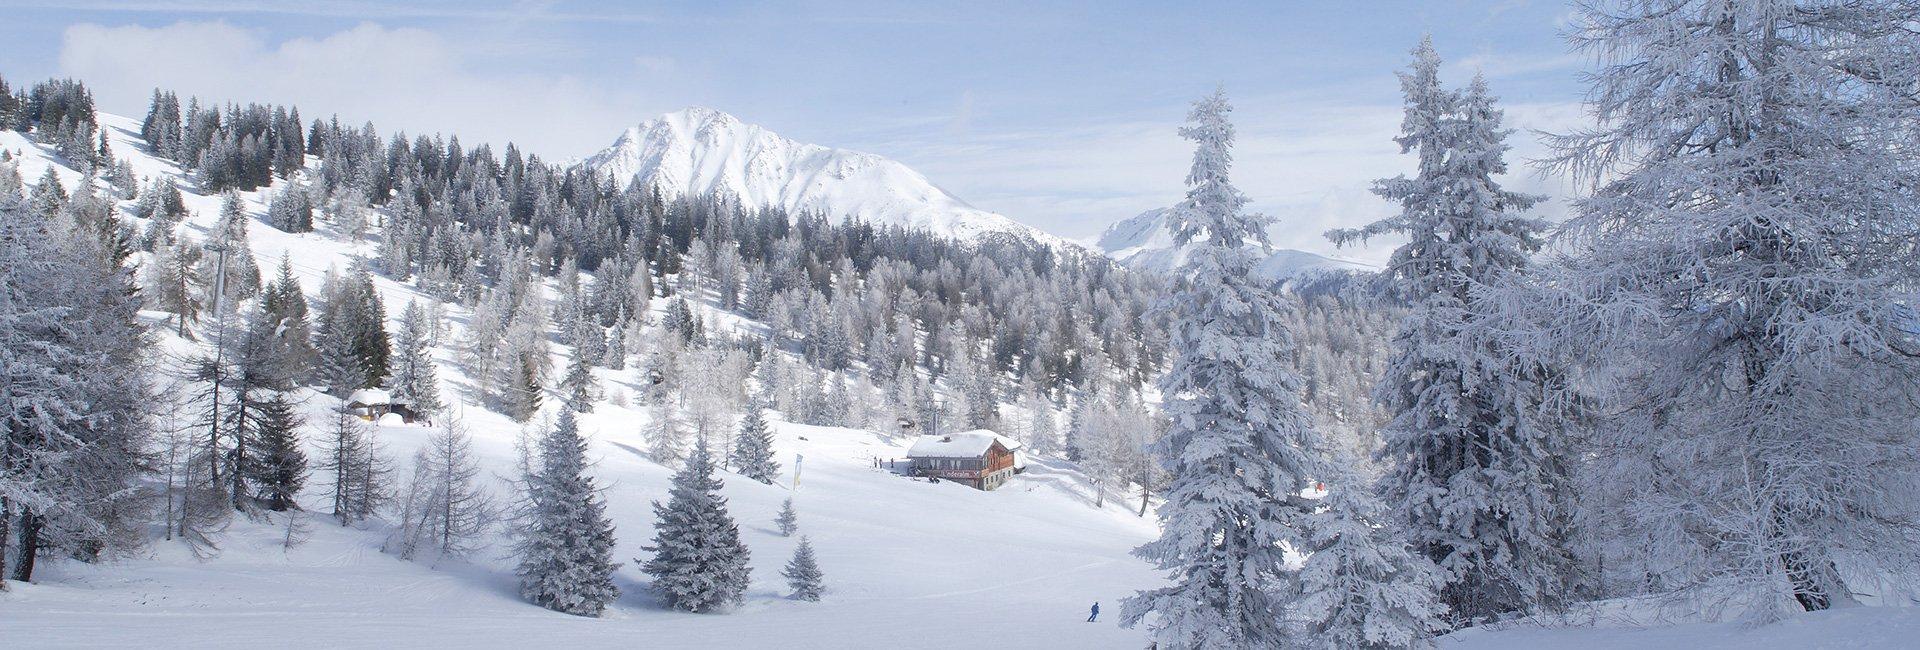 winterurlaub-suedtirol-05